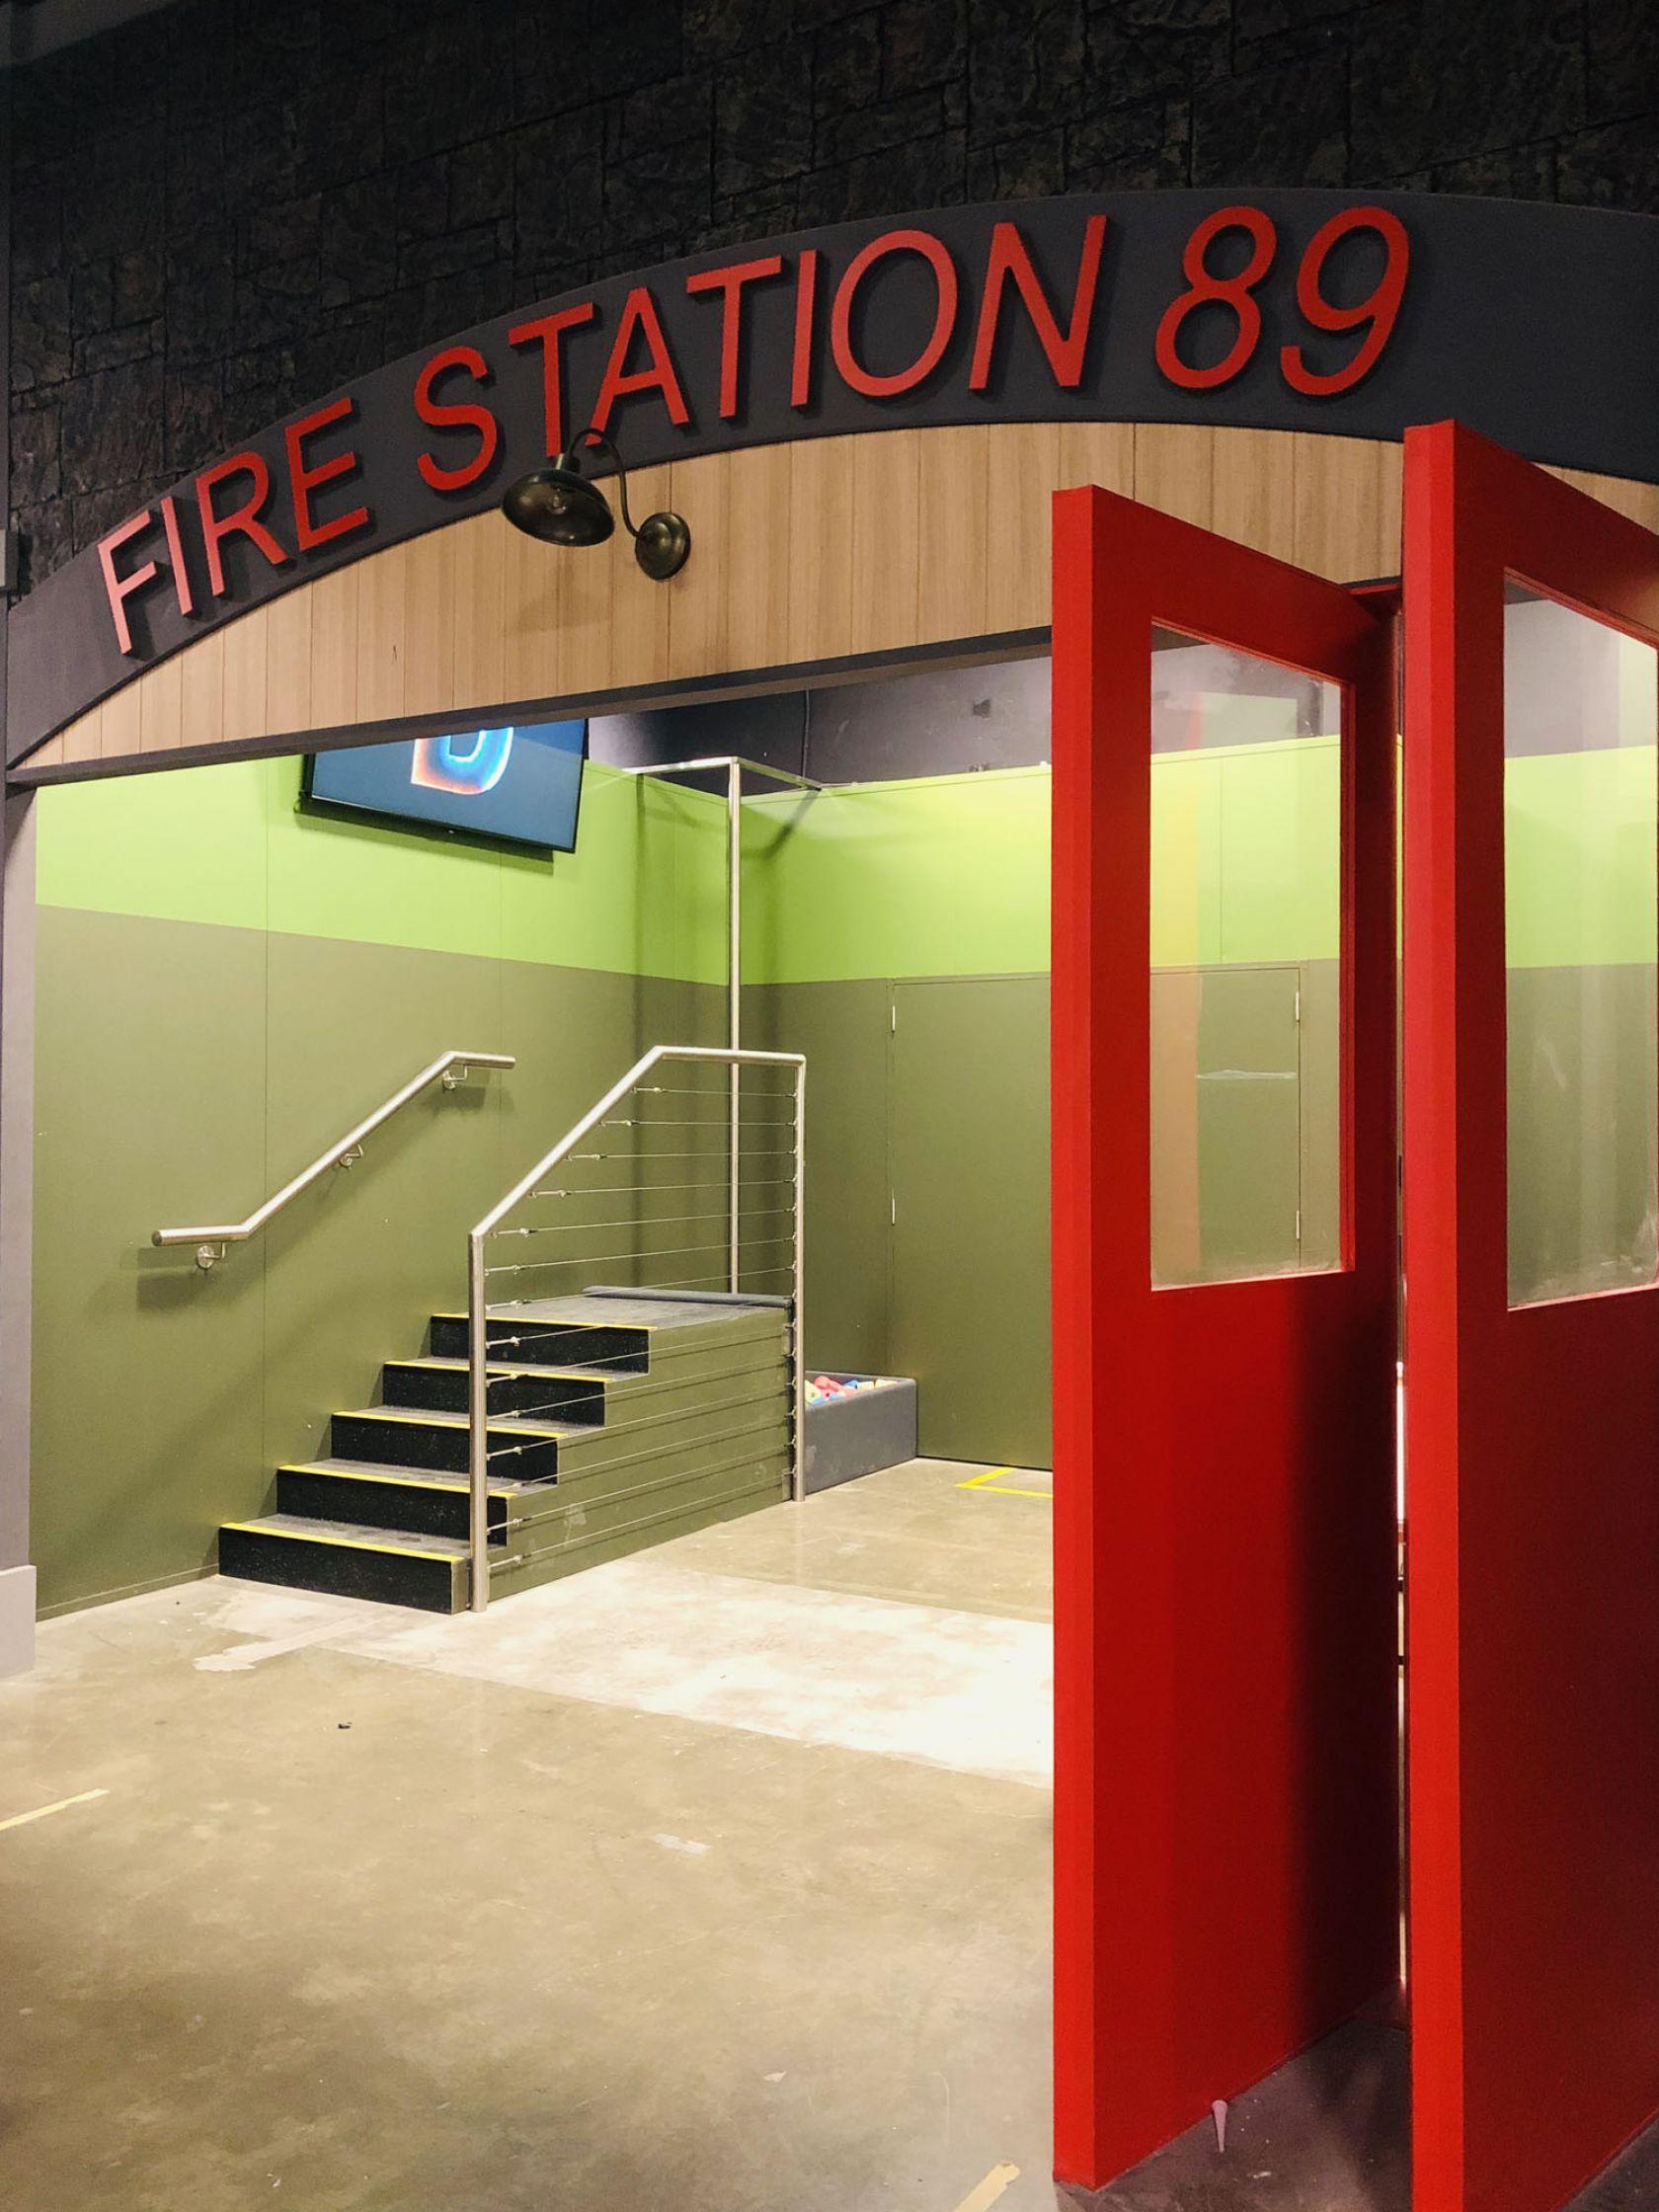 dreamcity south wharf fire station